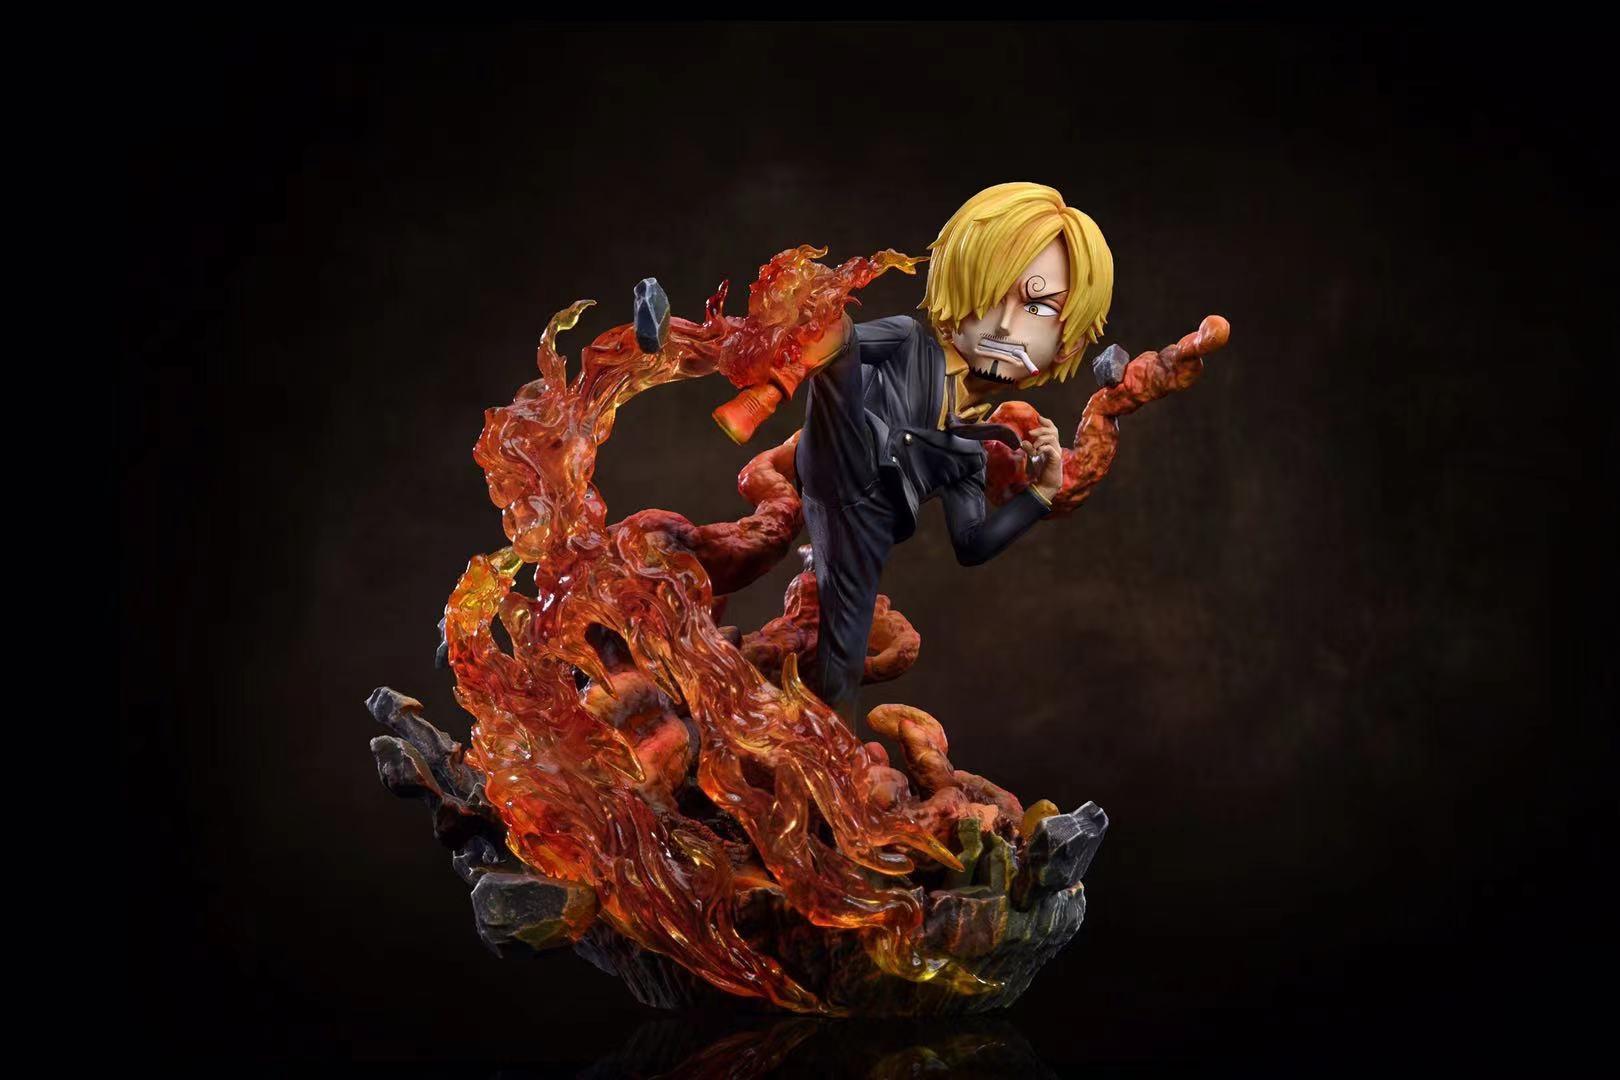 A แบบขาดำ Vinsmoke Sanji ซันจิ by G5 Studio (มัดจำ)